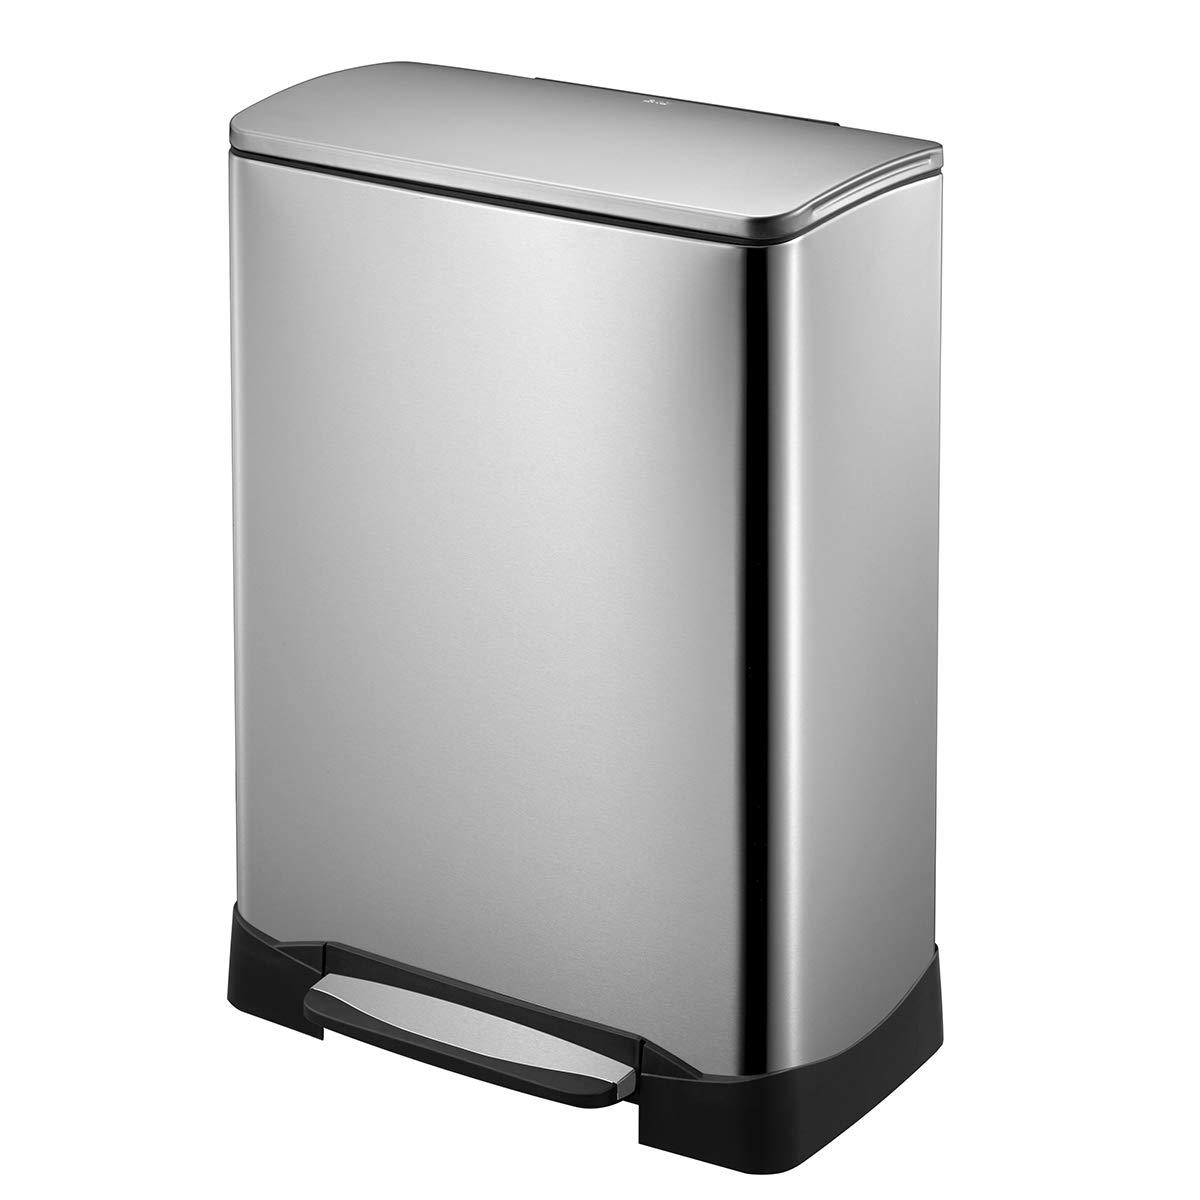 EKO NeoCube Stainless Steel Recycle 28L + 18L Step Trash Can EK9290MT-28+18L